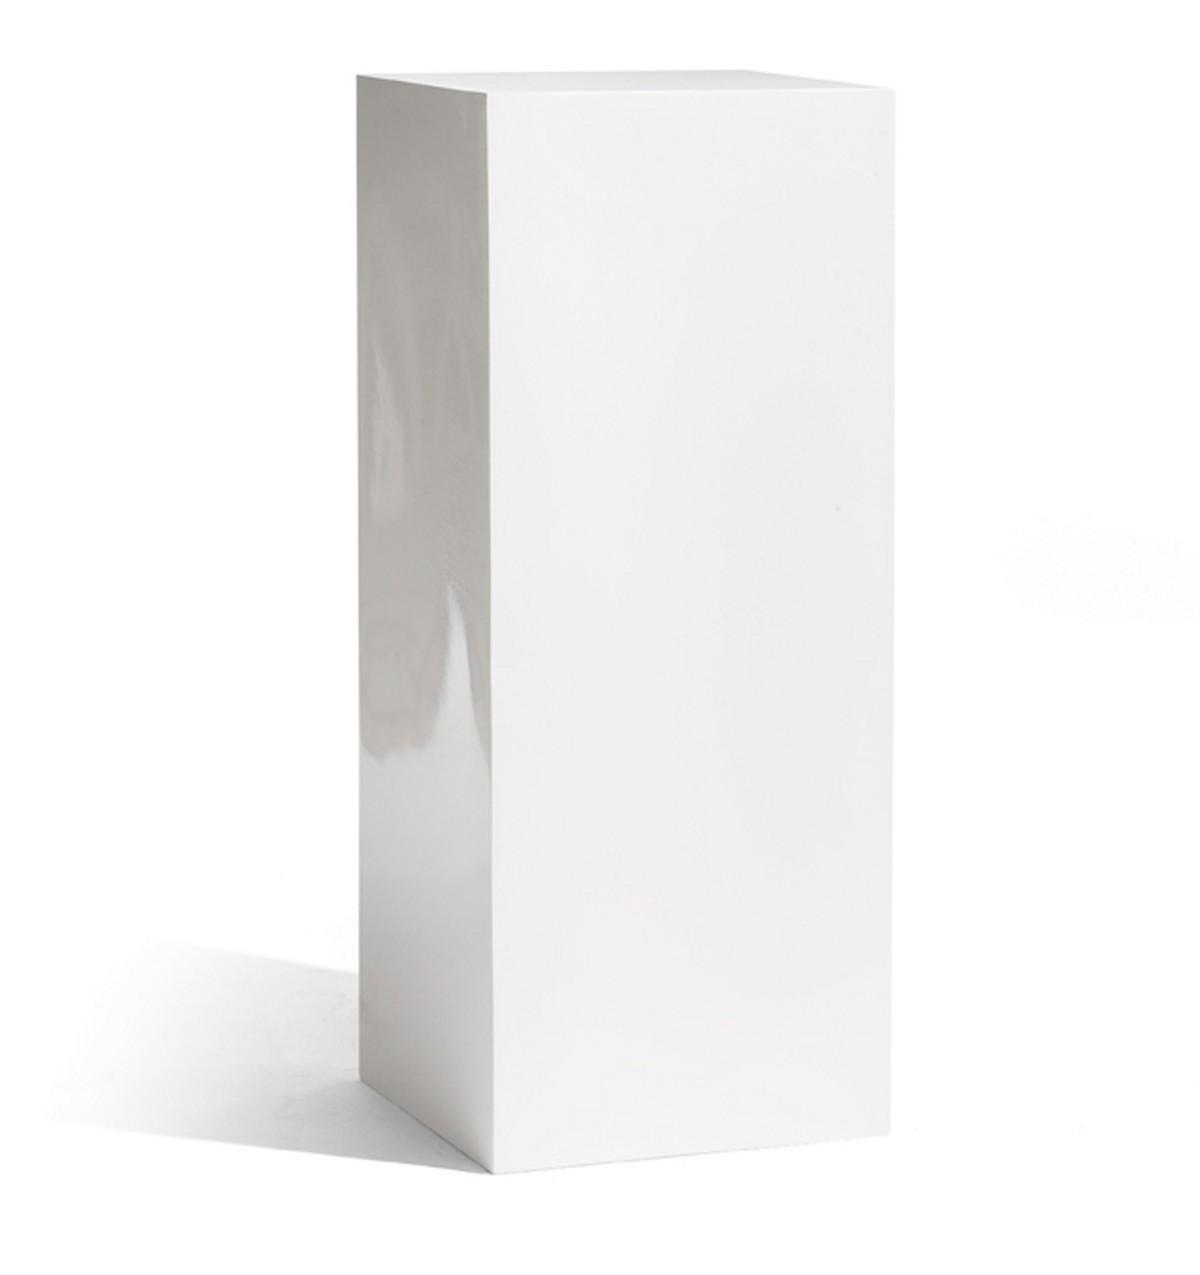 socle cube 100 de manutti blanc. Black Bedroom Furniture Sets. Home Design Ideas